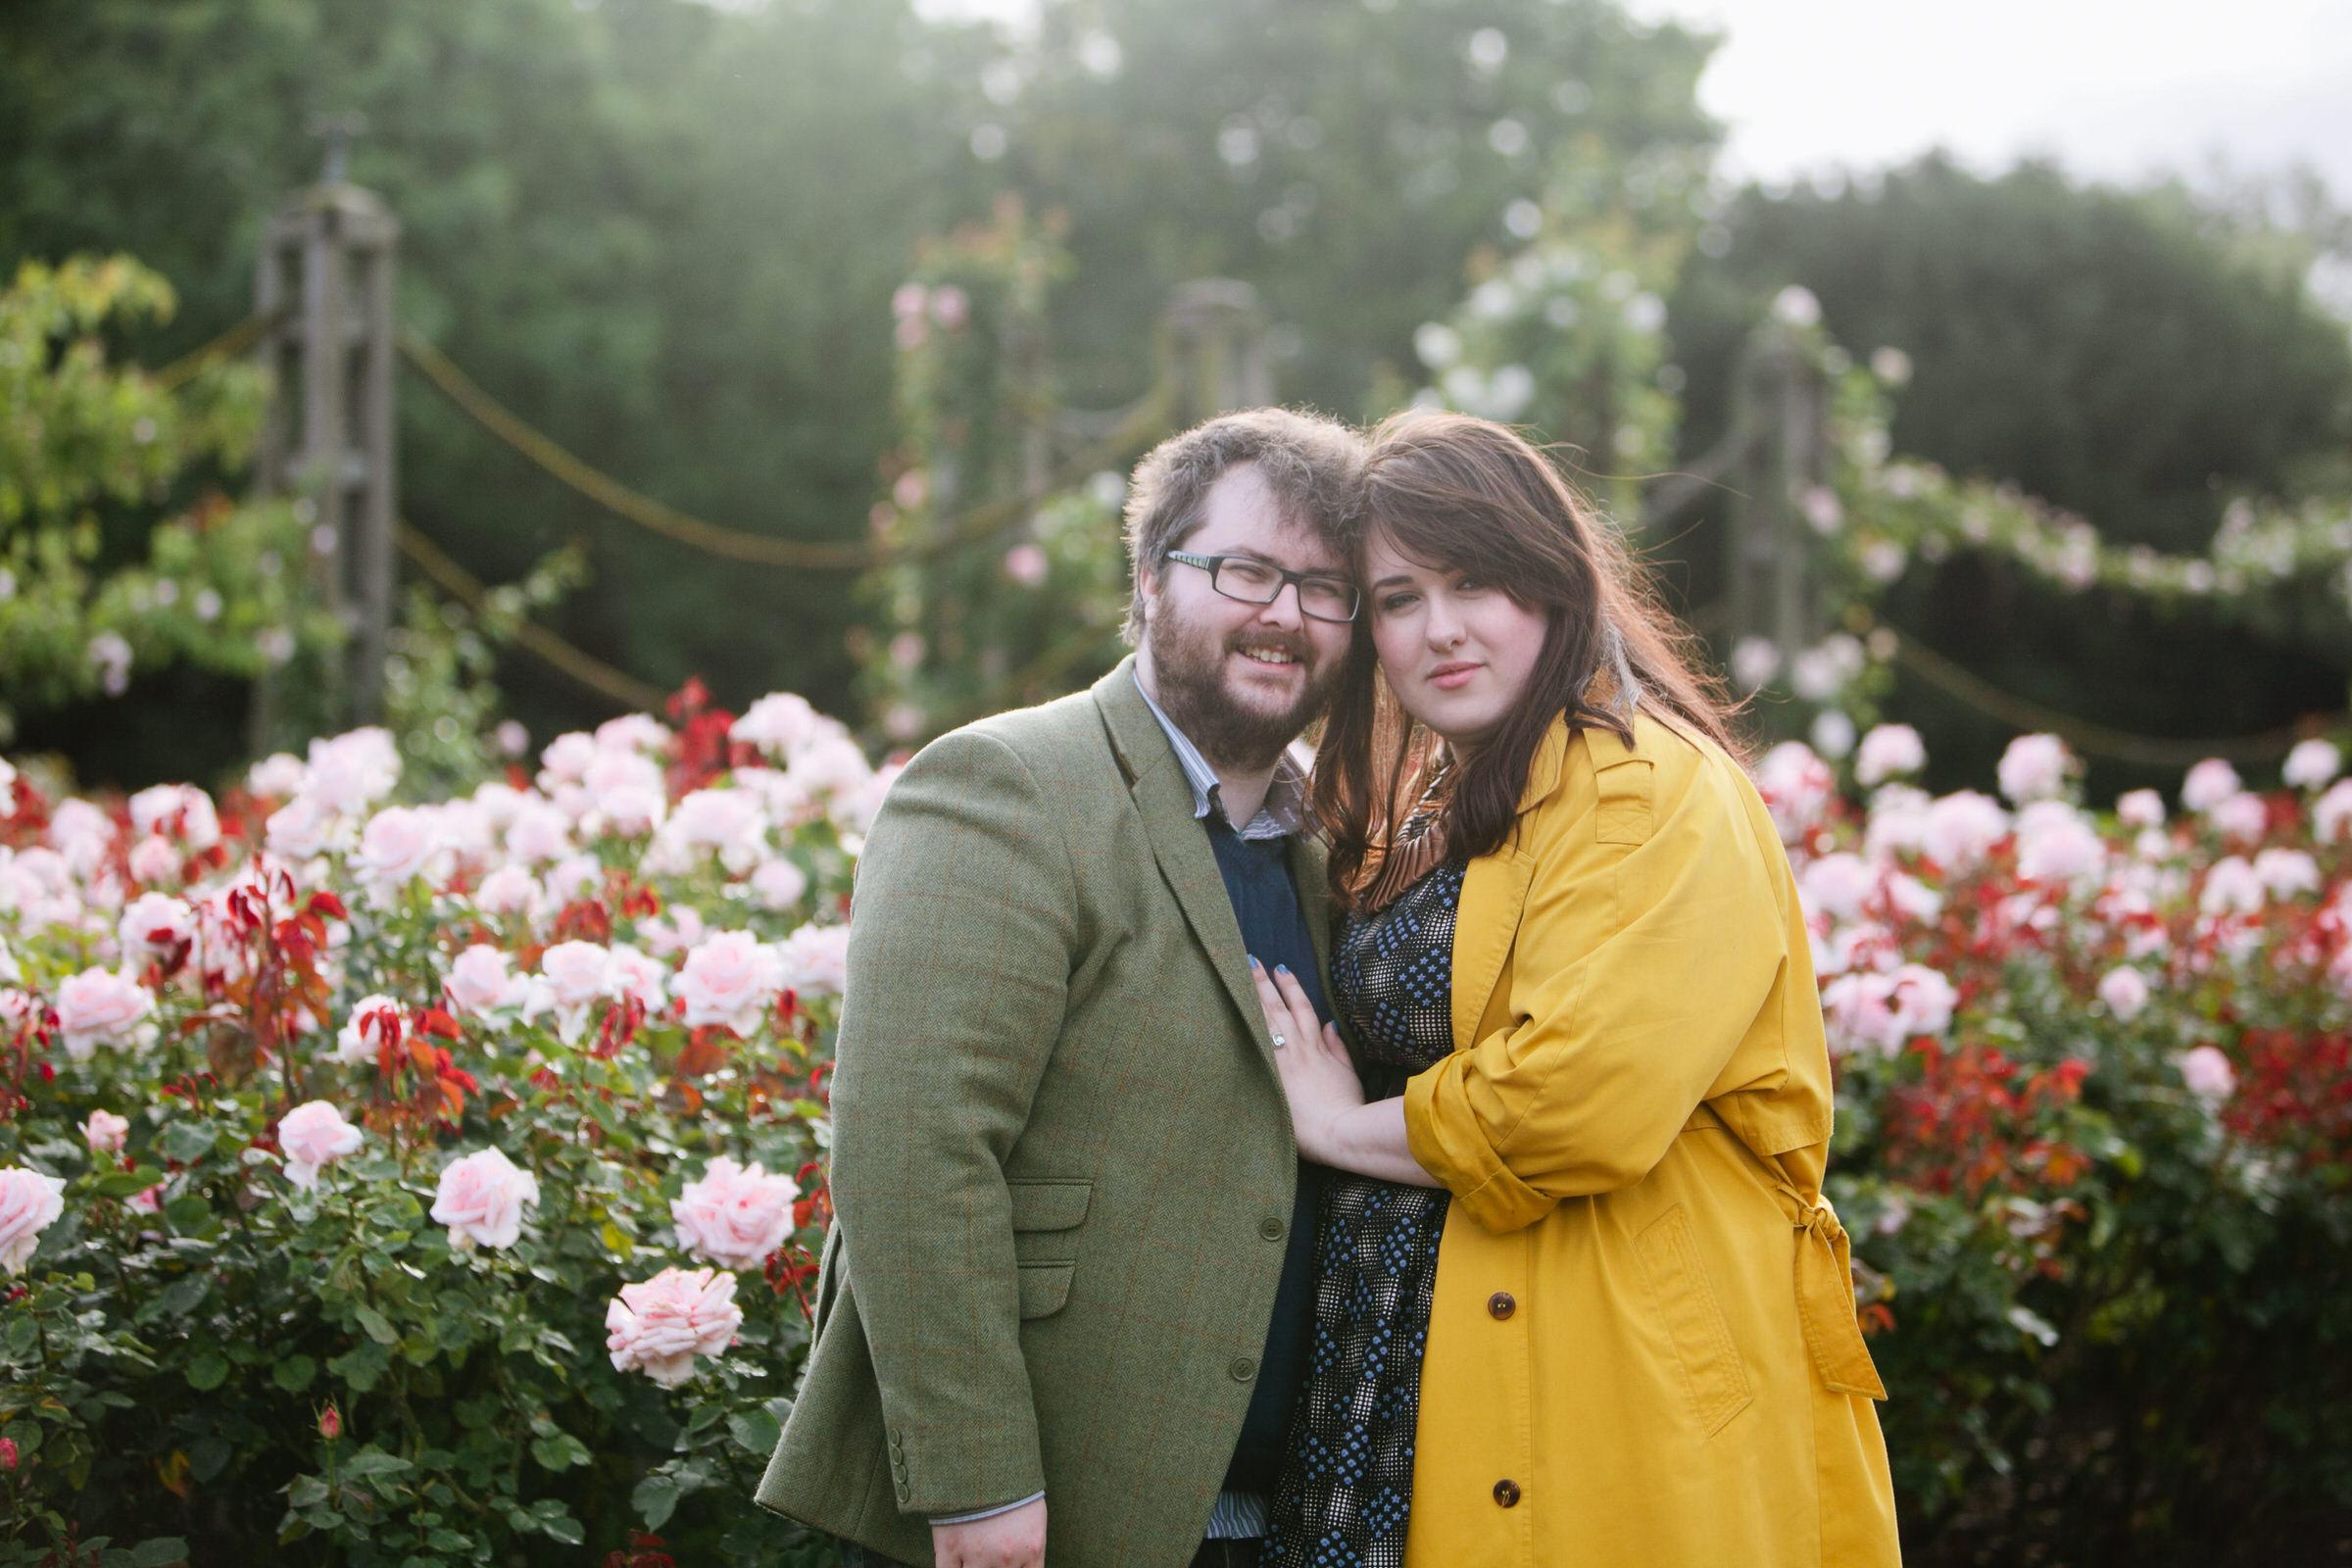 Engagement photos taken in Regents Park, London